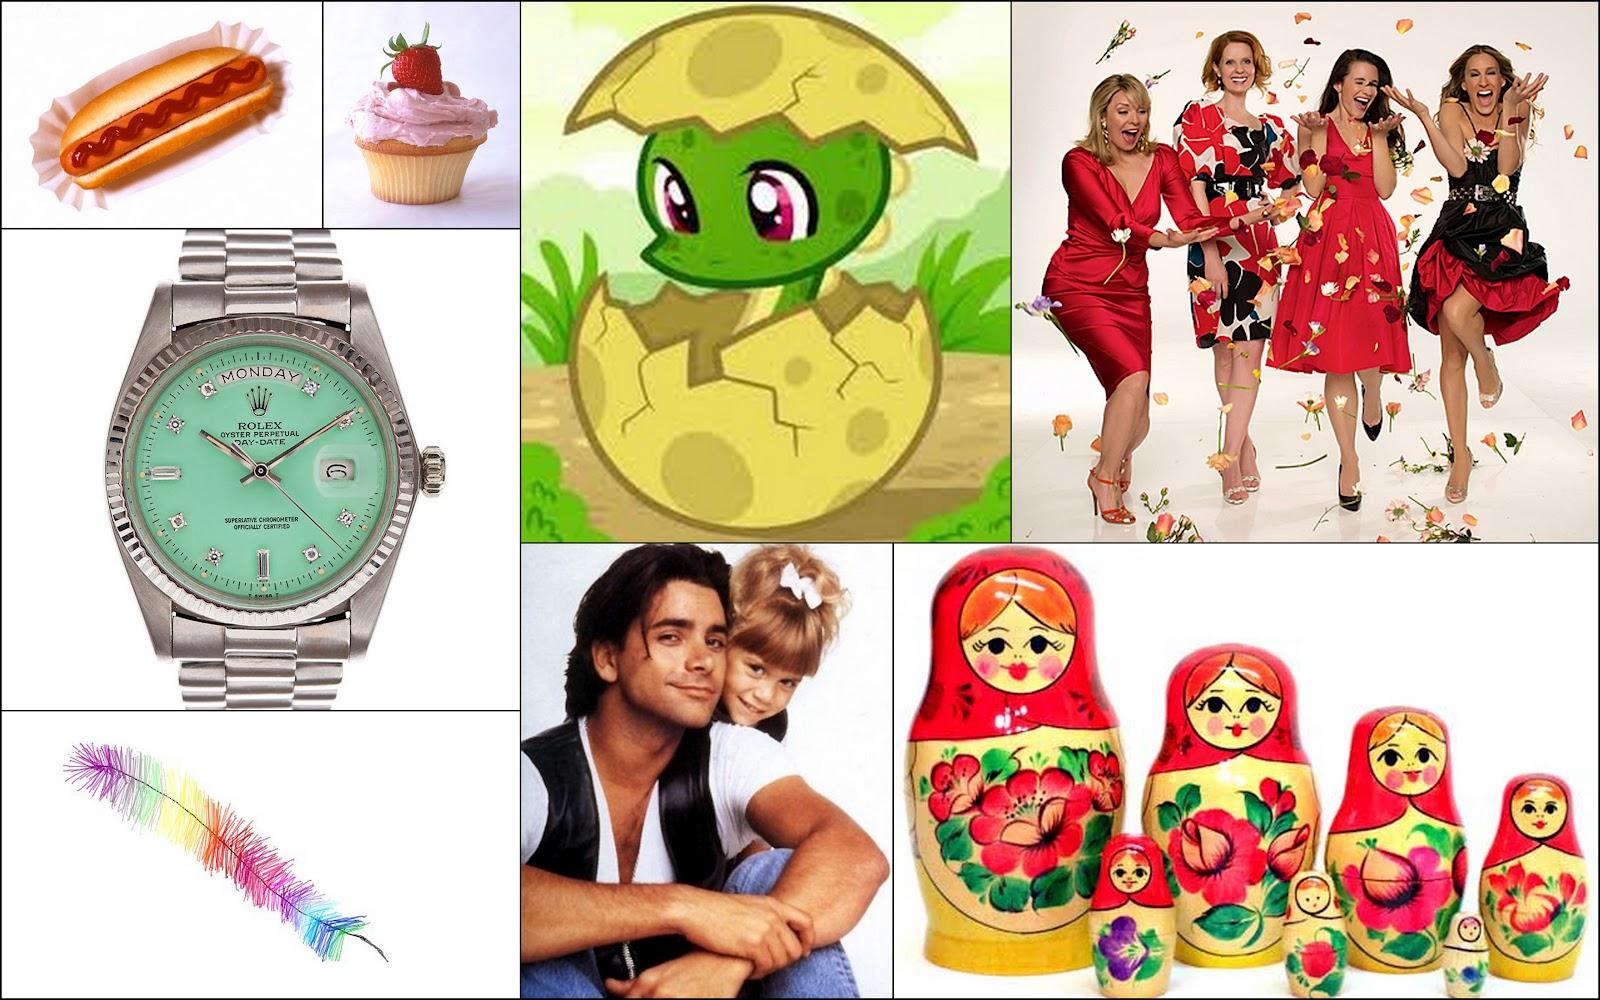 http://2.bp.blogspot.com/-wLgJ6itEhZY/T5DN3oURRvI/AAAAAAAAENk/aL1_OfChsqg/s1600/favorite+things.jpg